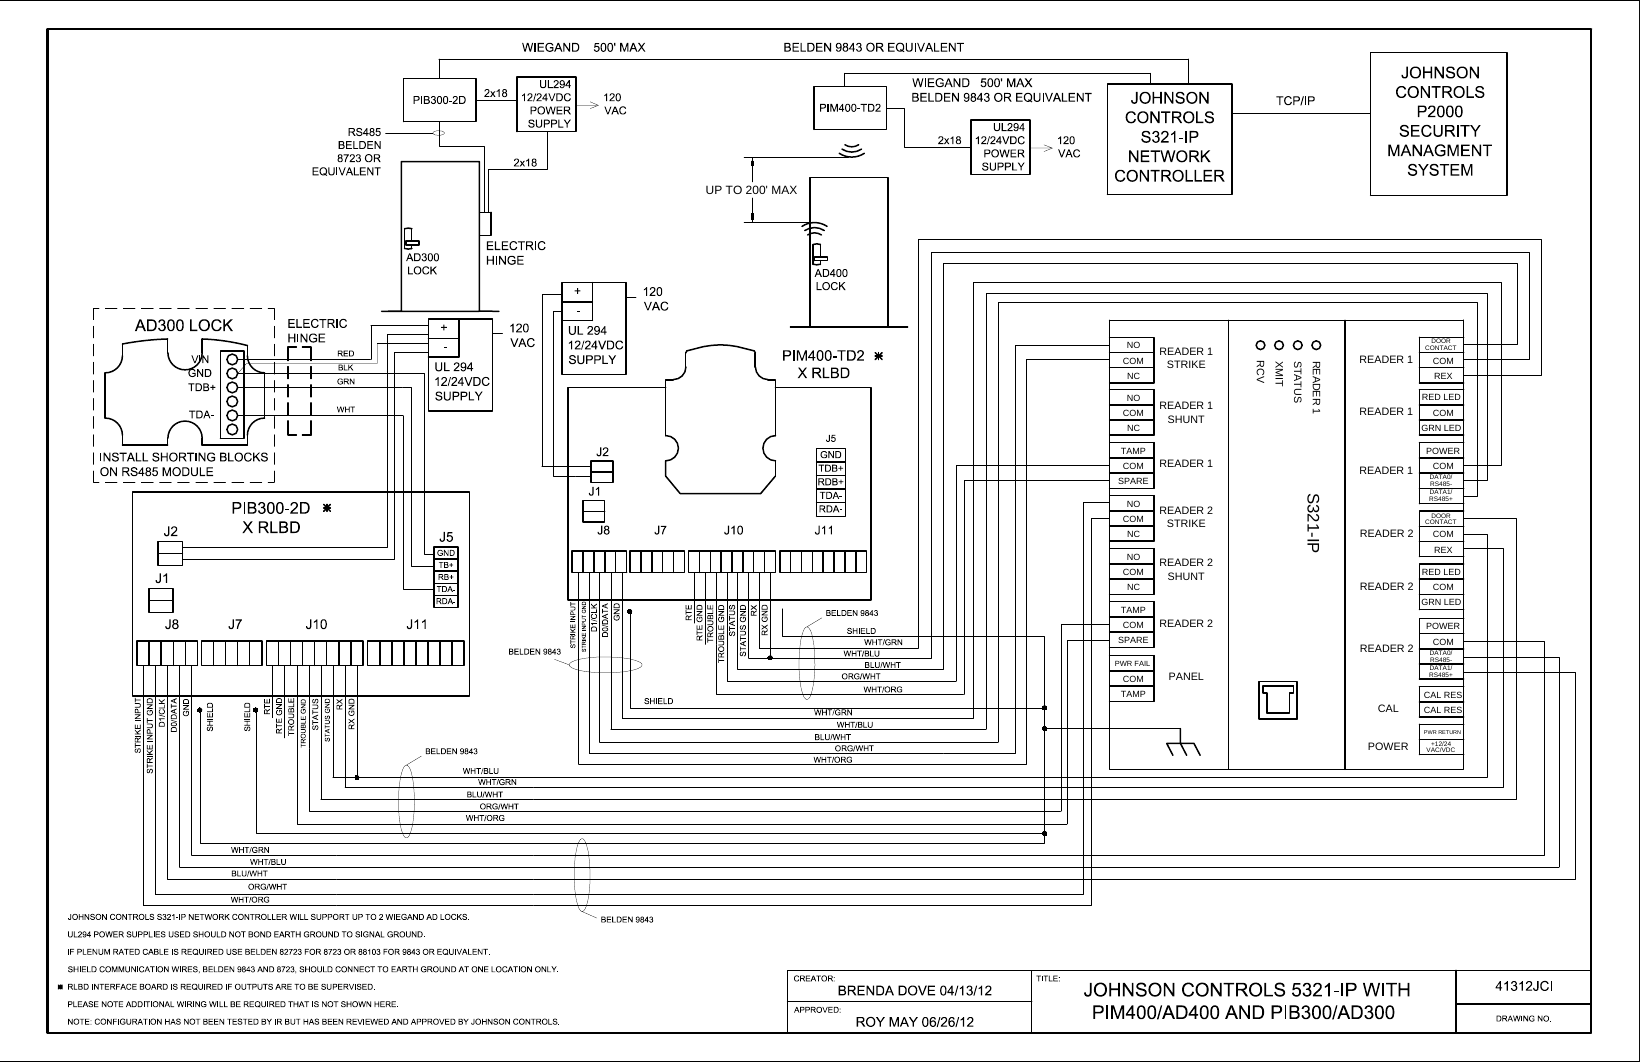 schlage electronics ad300 ad400 wiring diagram johnson